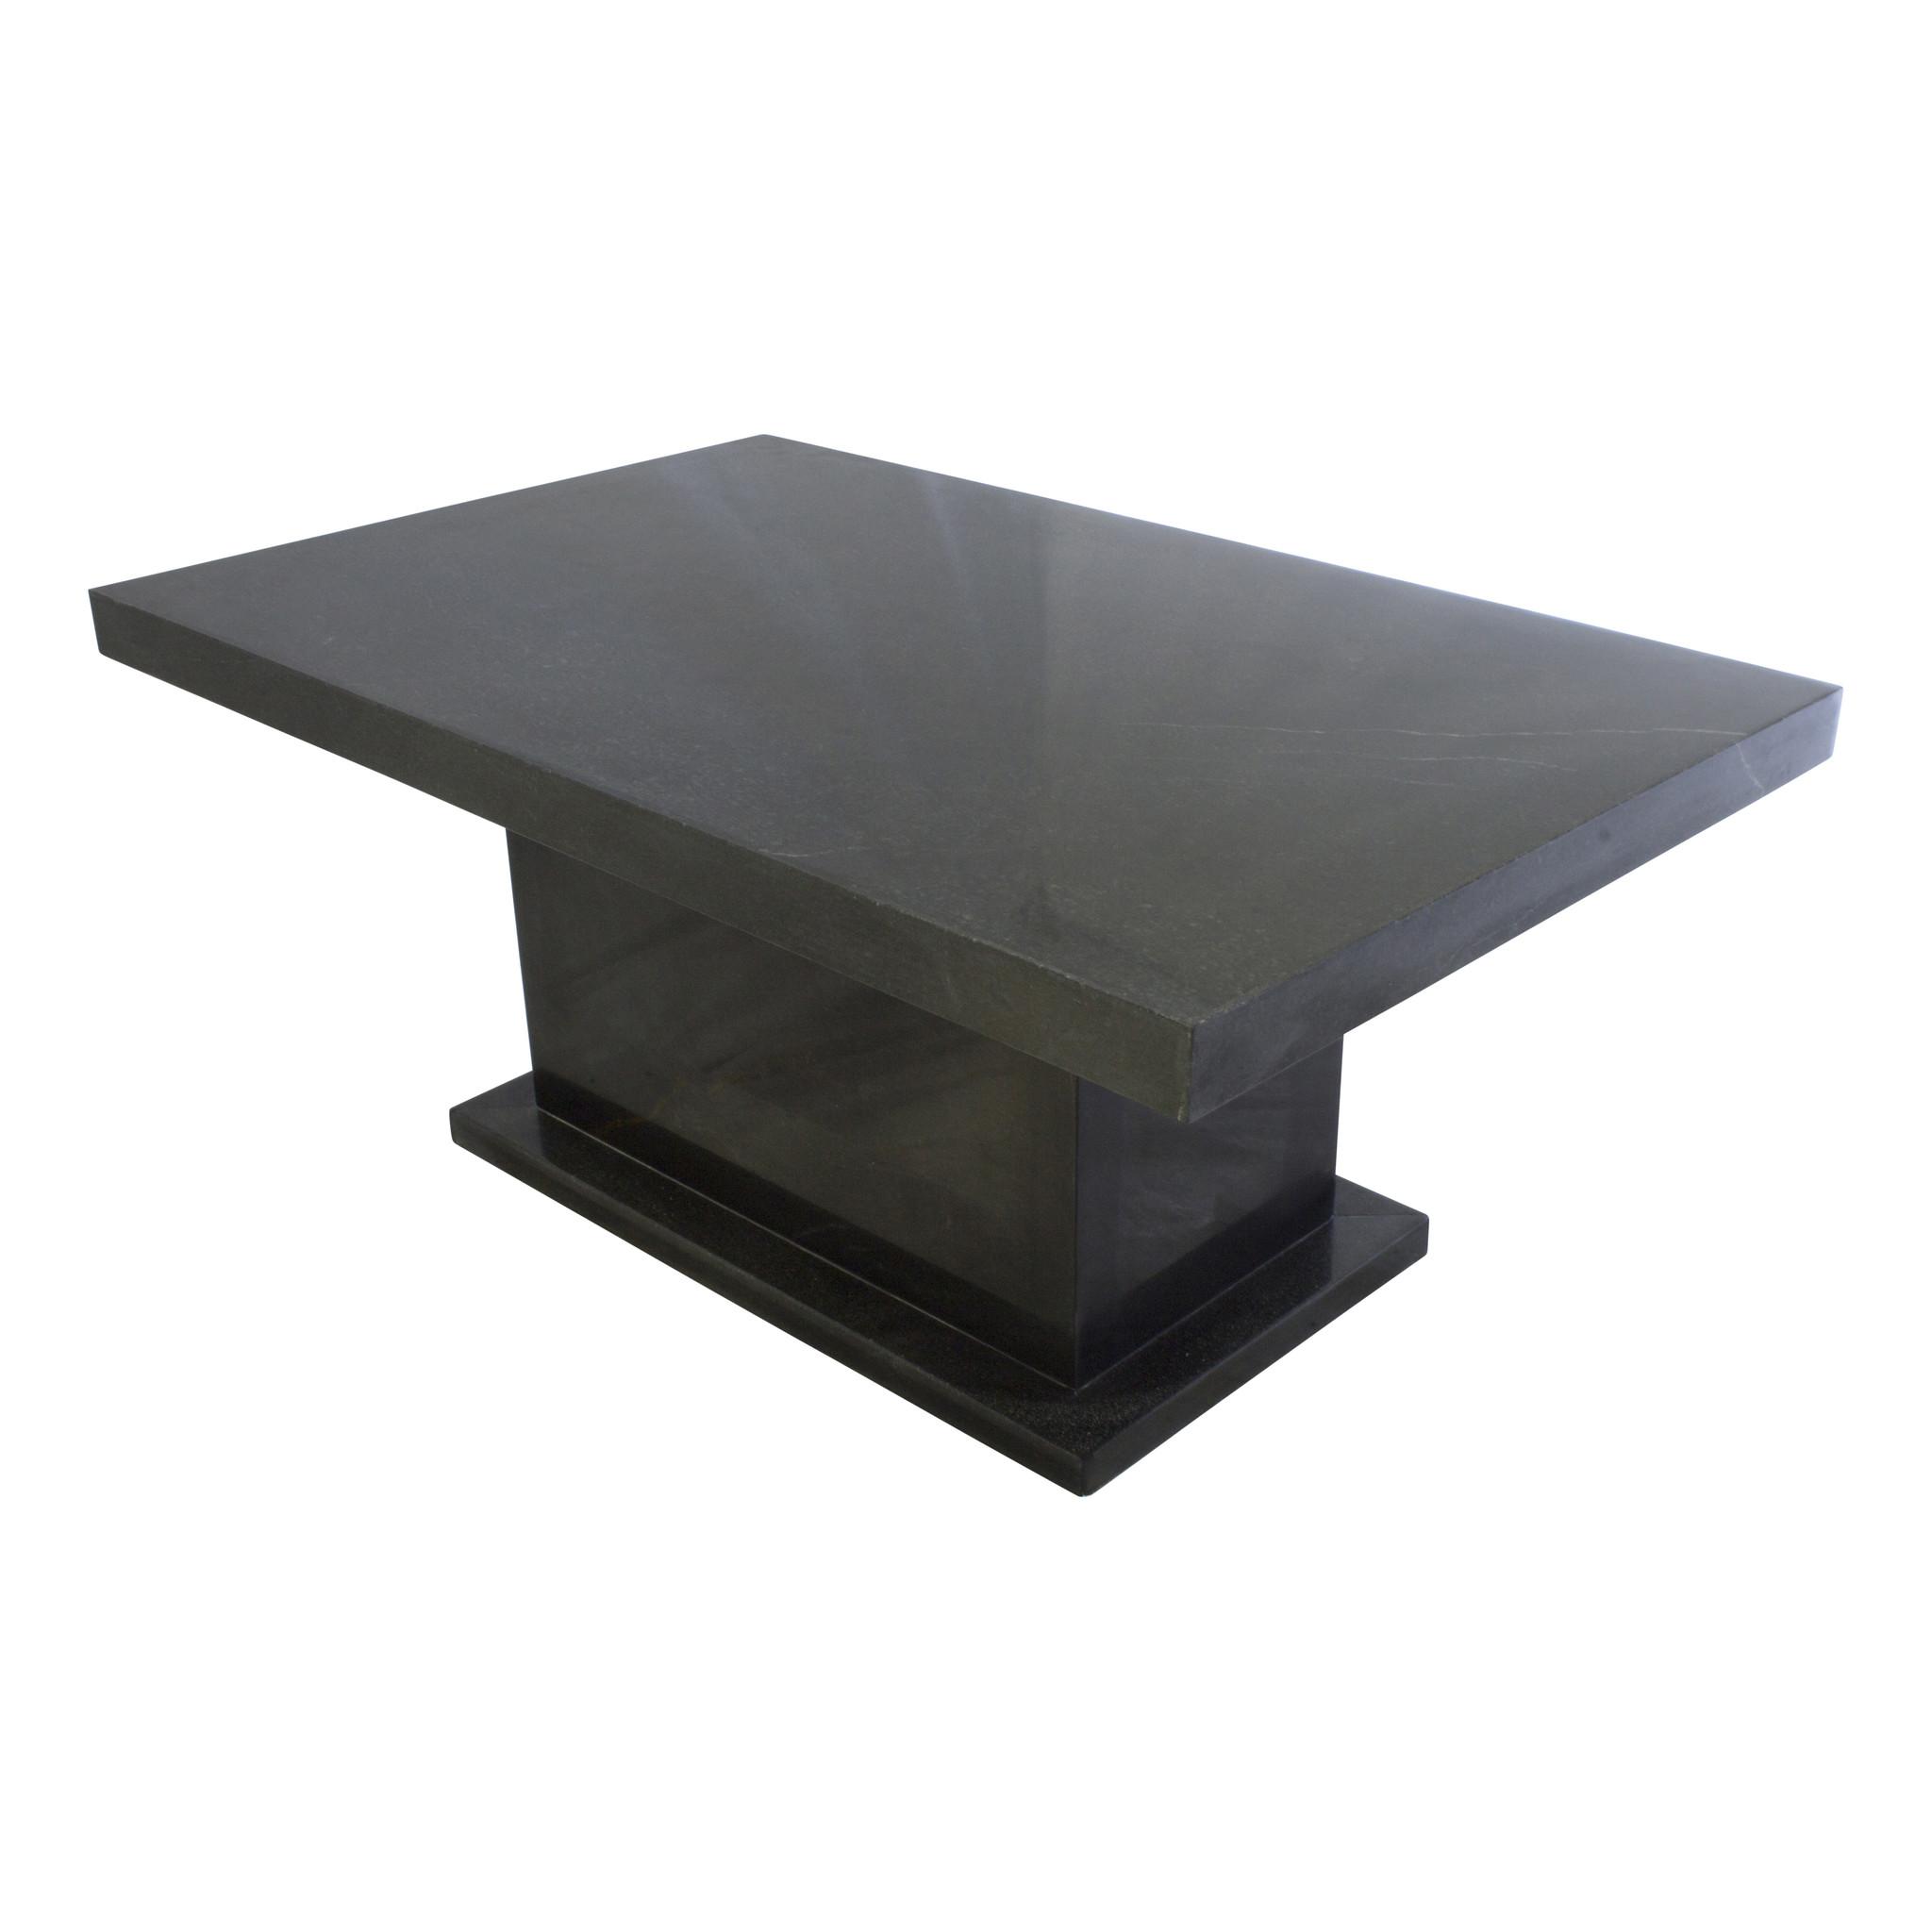 Indomarmer Coffee table Rectangle 110x70x45 cm Black Marble